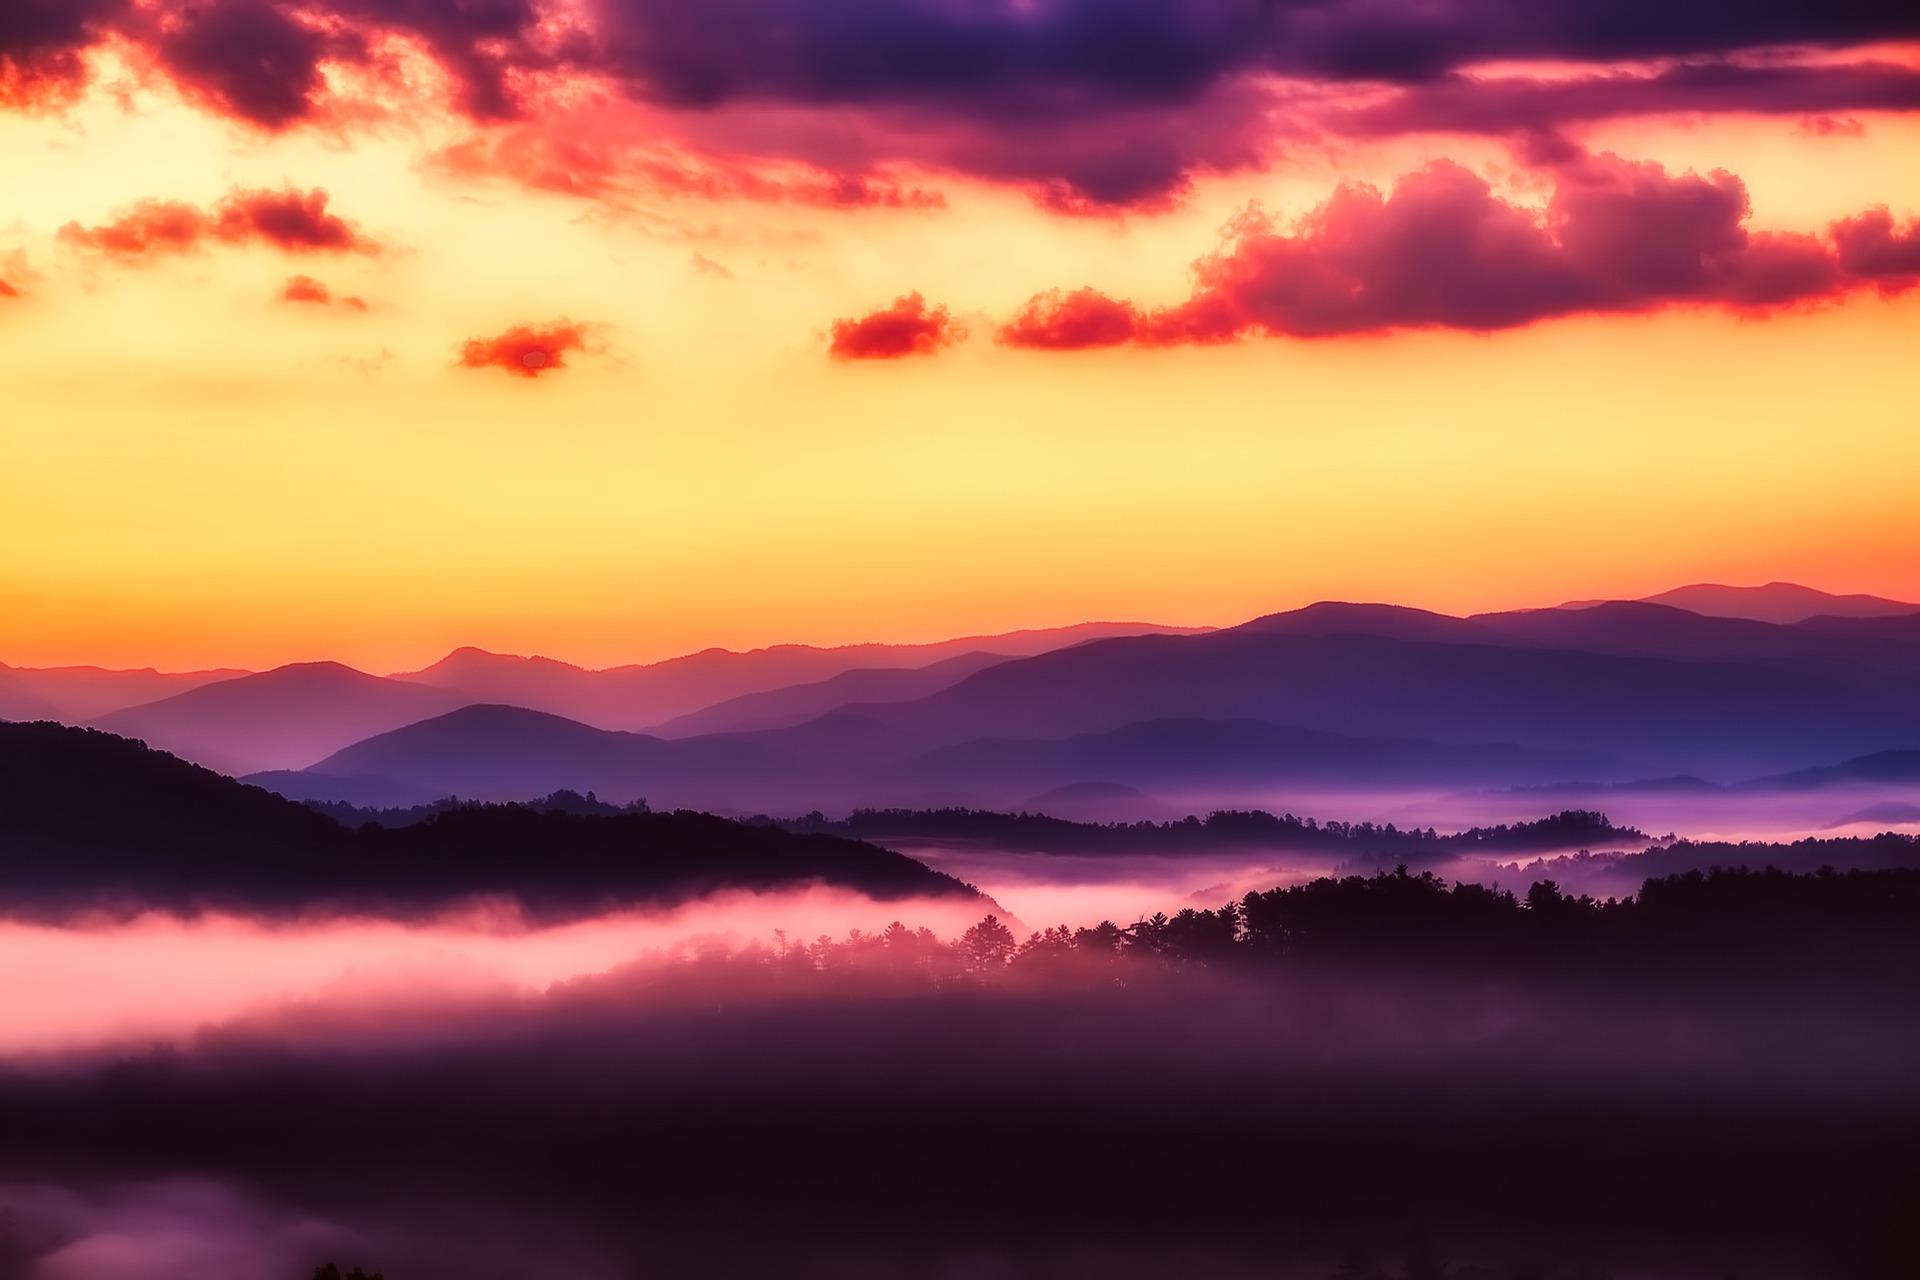 Mist hangs above a purple dusky mountain and forest landscape.